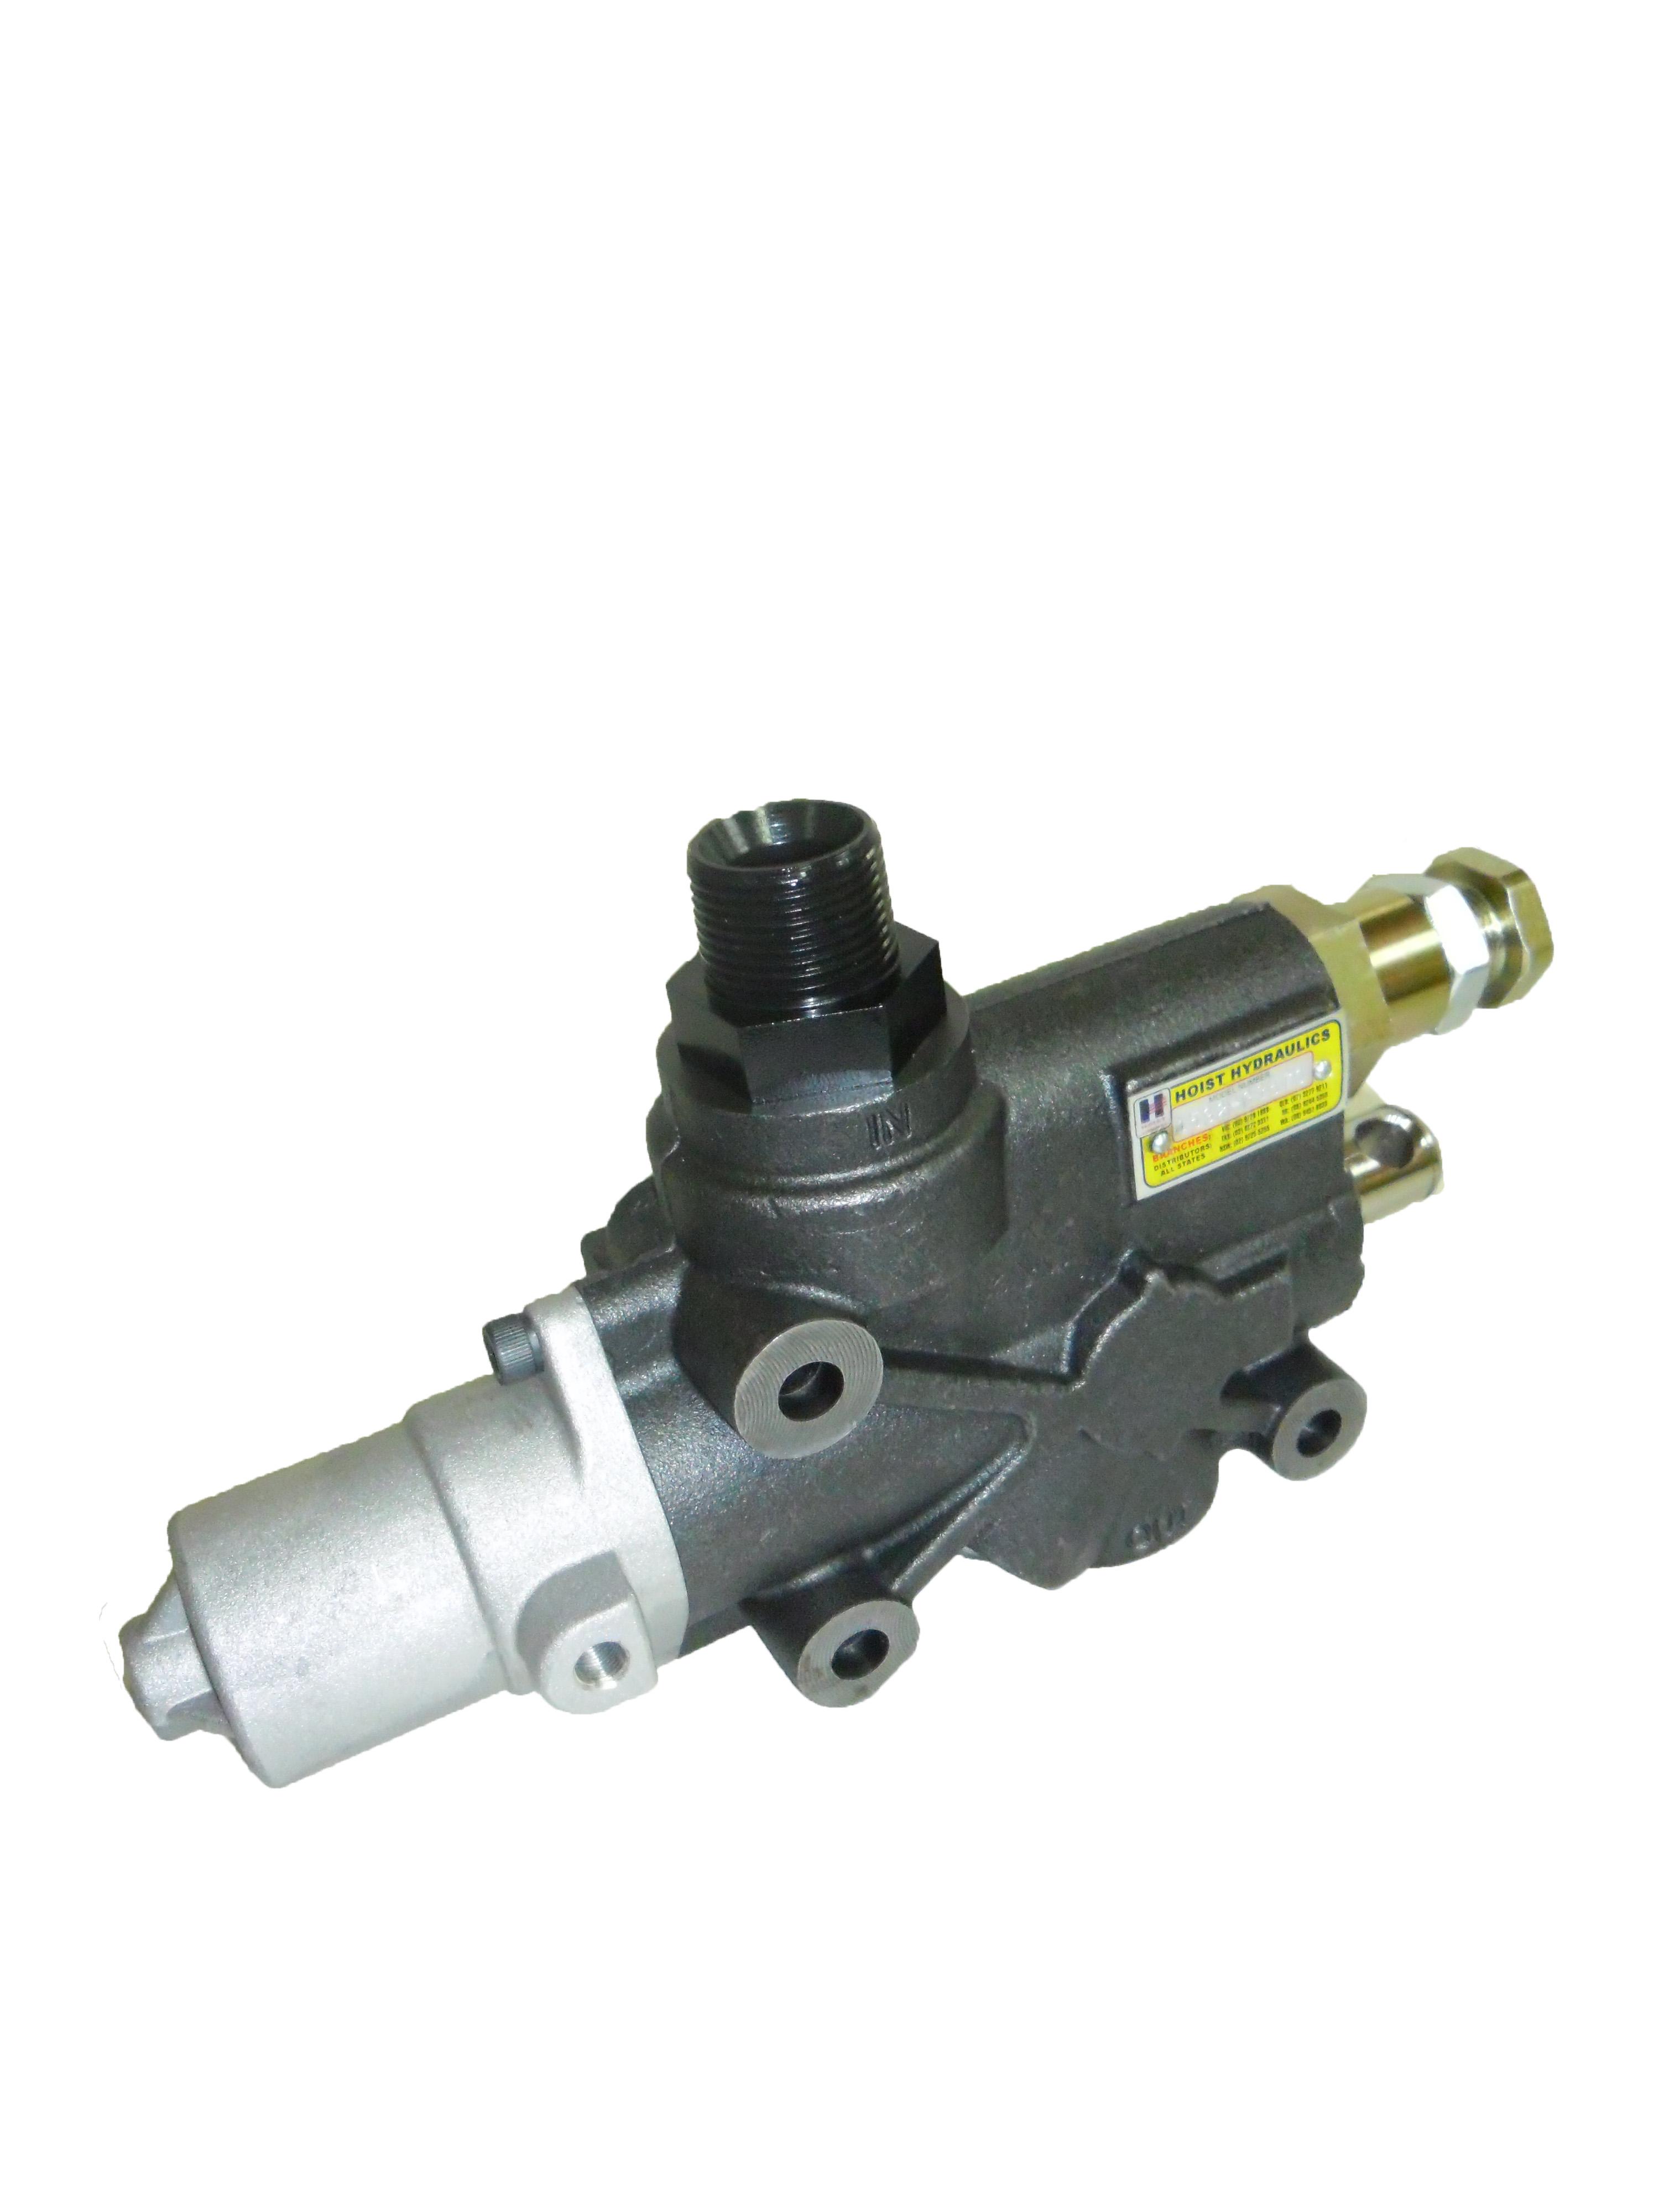 TIPPER CONTROL VALVE « Hoist Hydraulics